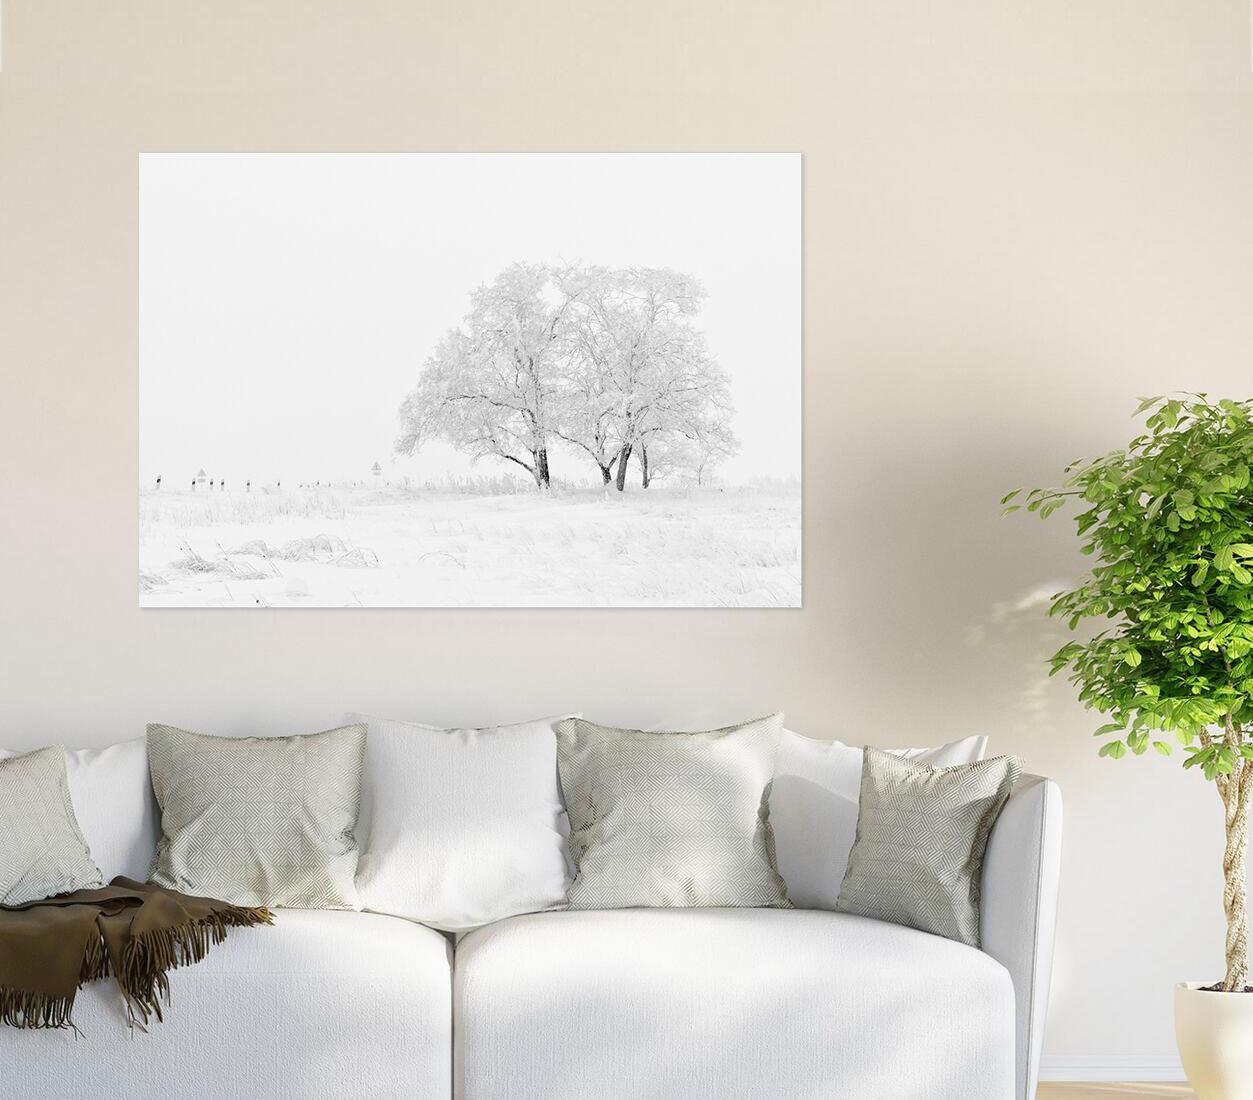 3D Strahlend Schnee Baum 8774 Fototapeten Wandbild BildTapete AJSTORE DE Lemon